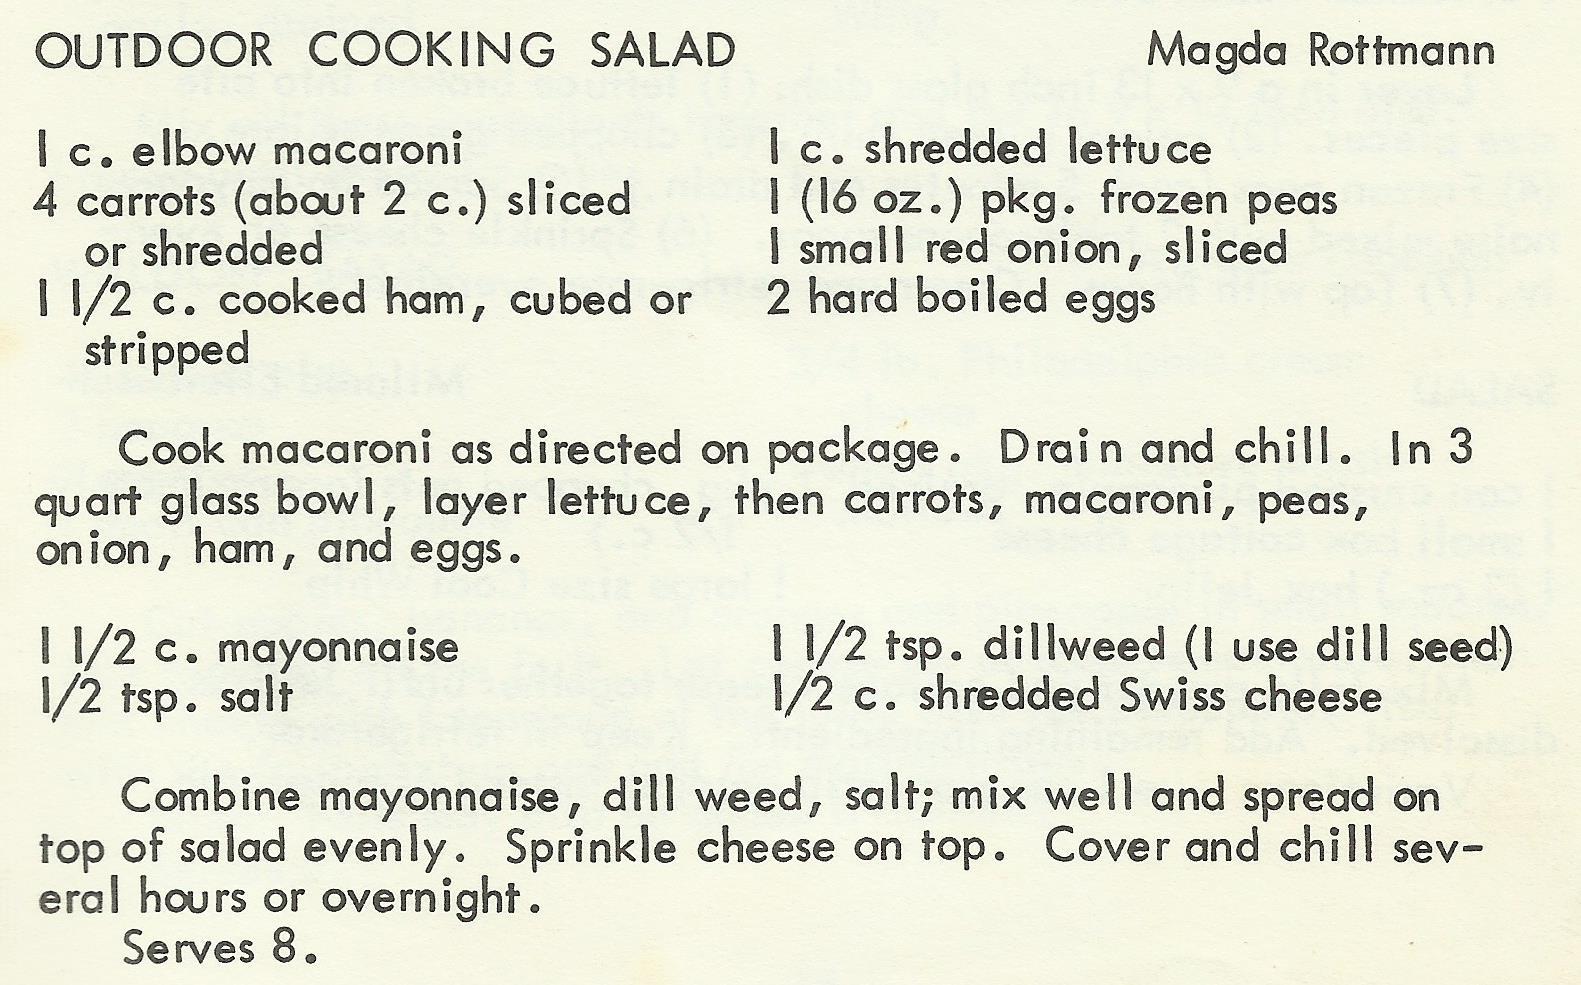 Outdoor Cooking Salad